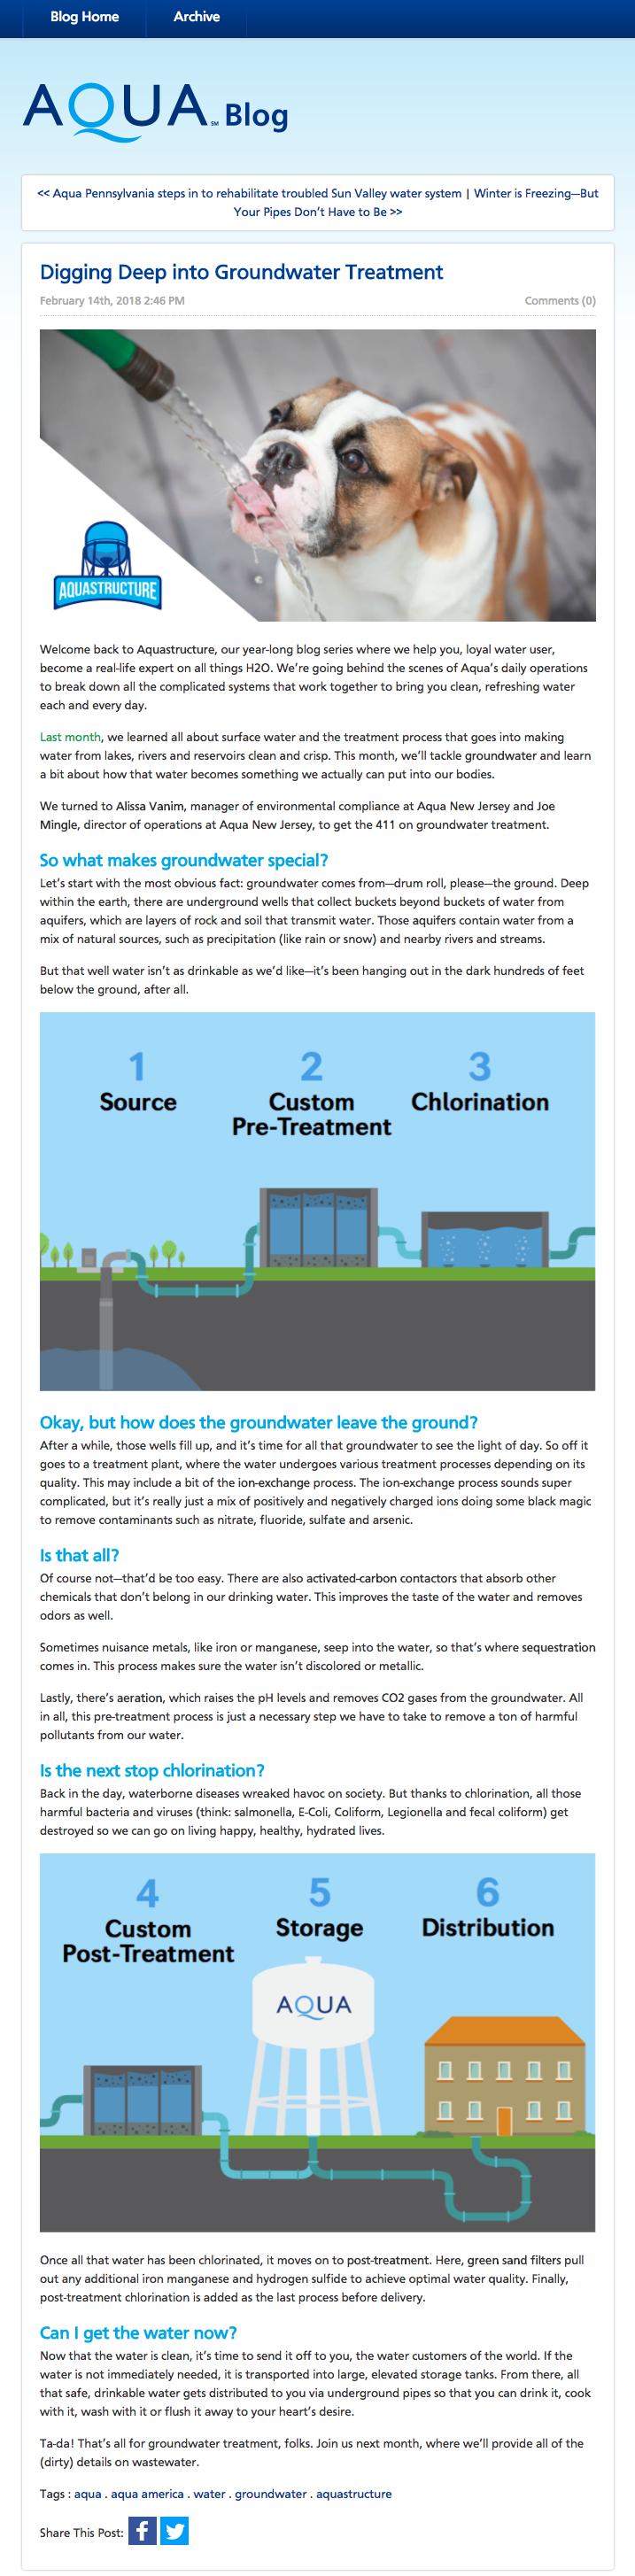 Aqua_Digging Deep into Groundwater Treatment.png